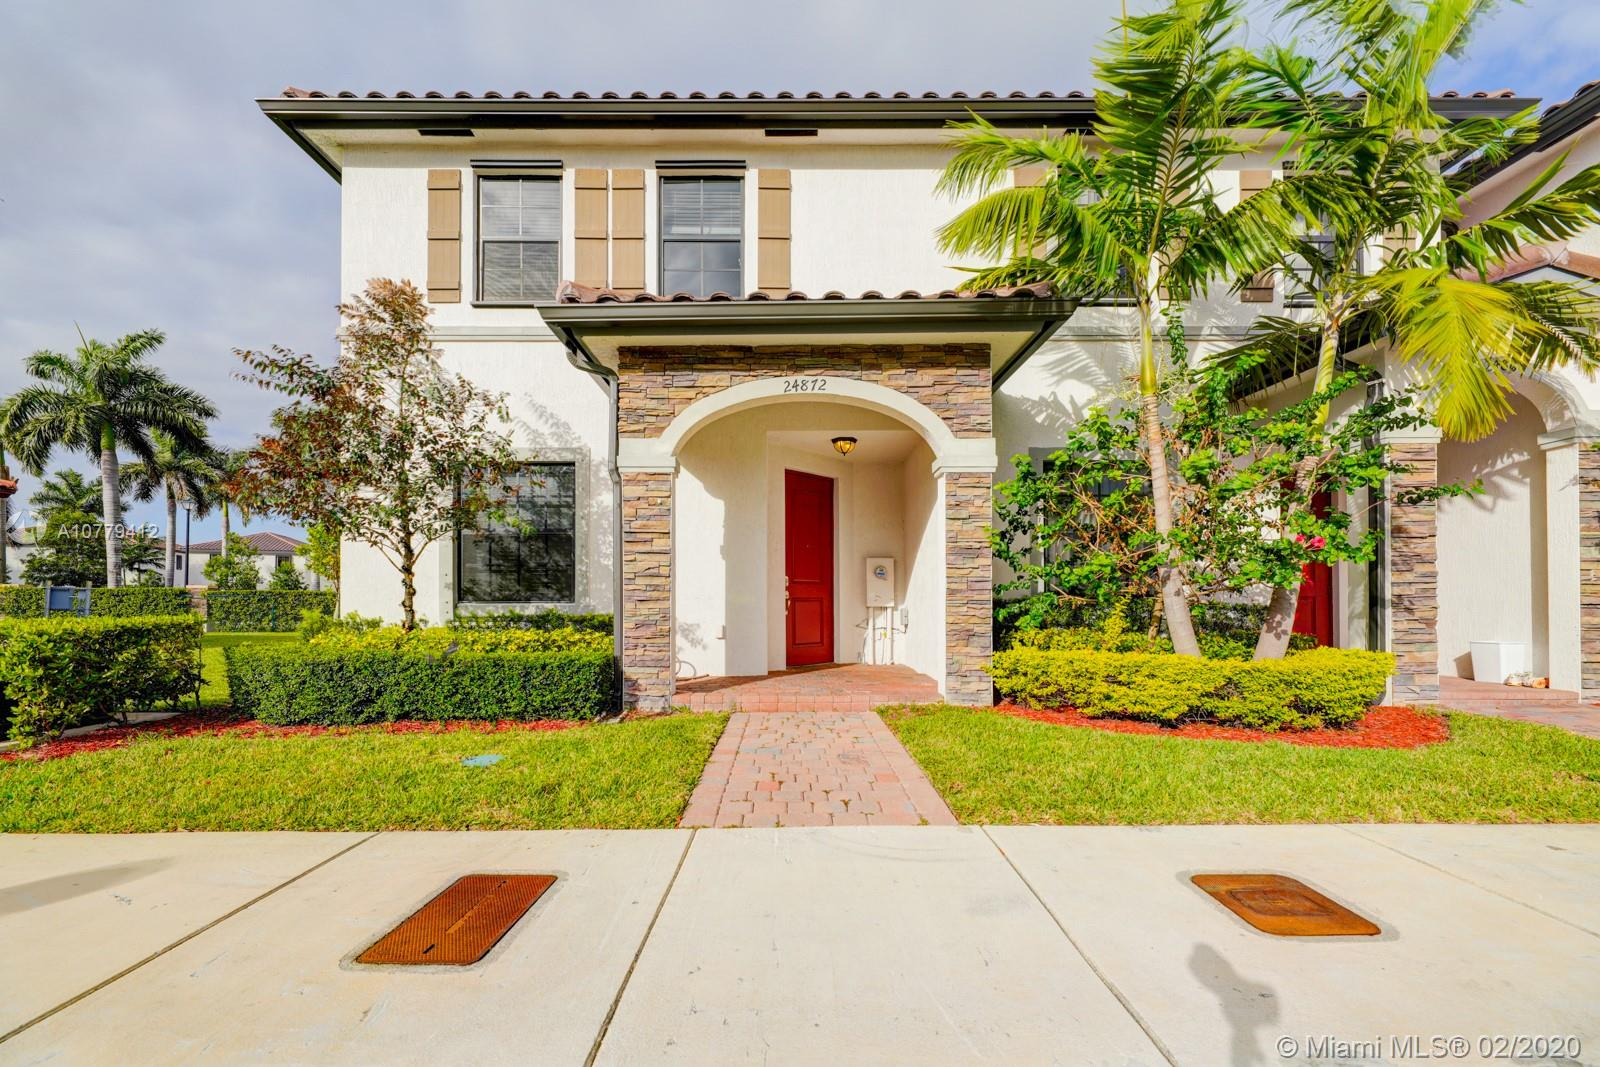 24872 116th Ave #0, Homestead, FL 33032 - Homestead, FL real estate listing